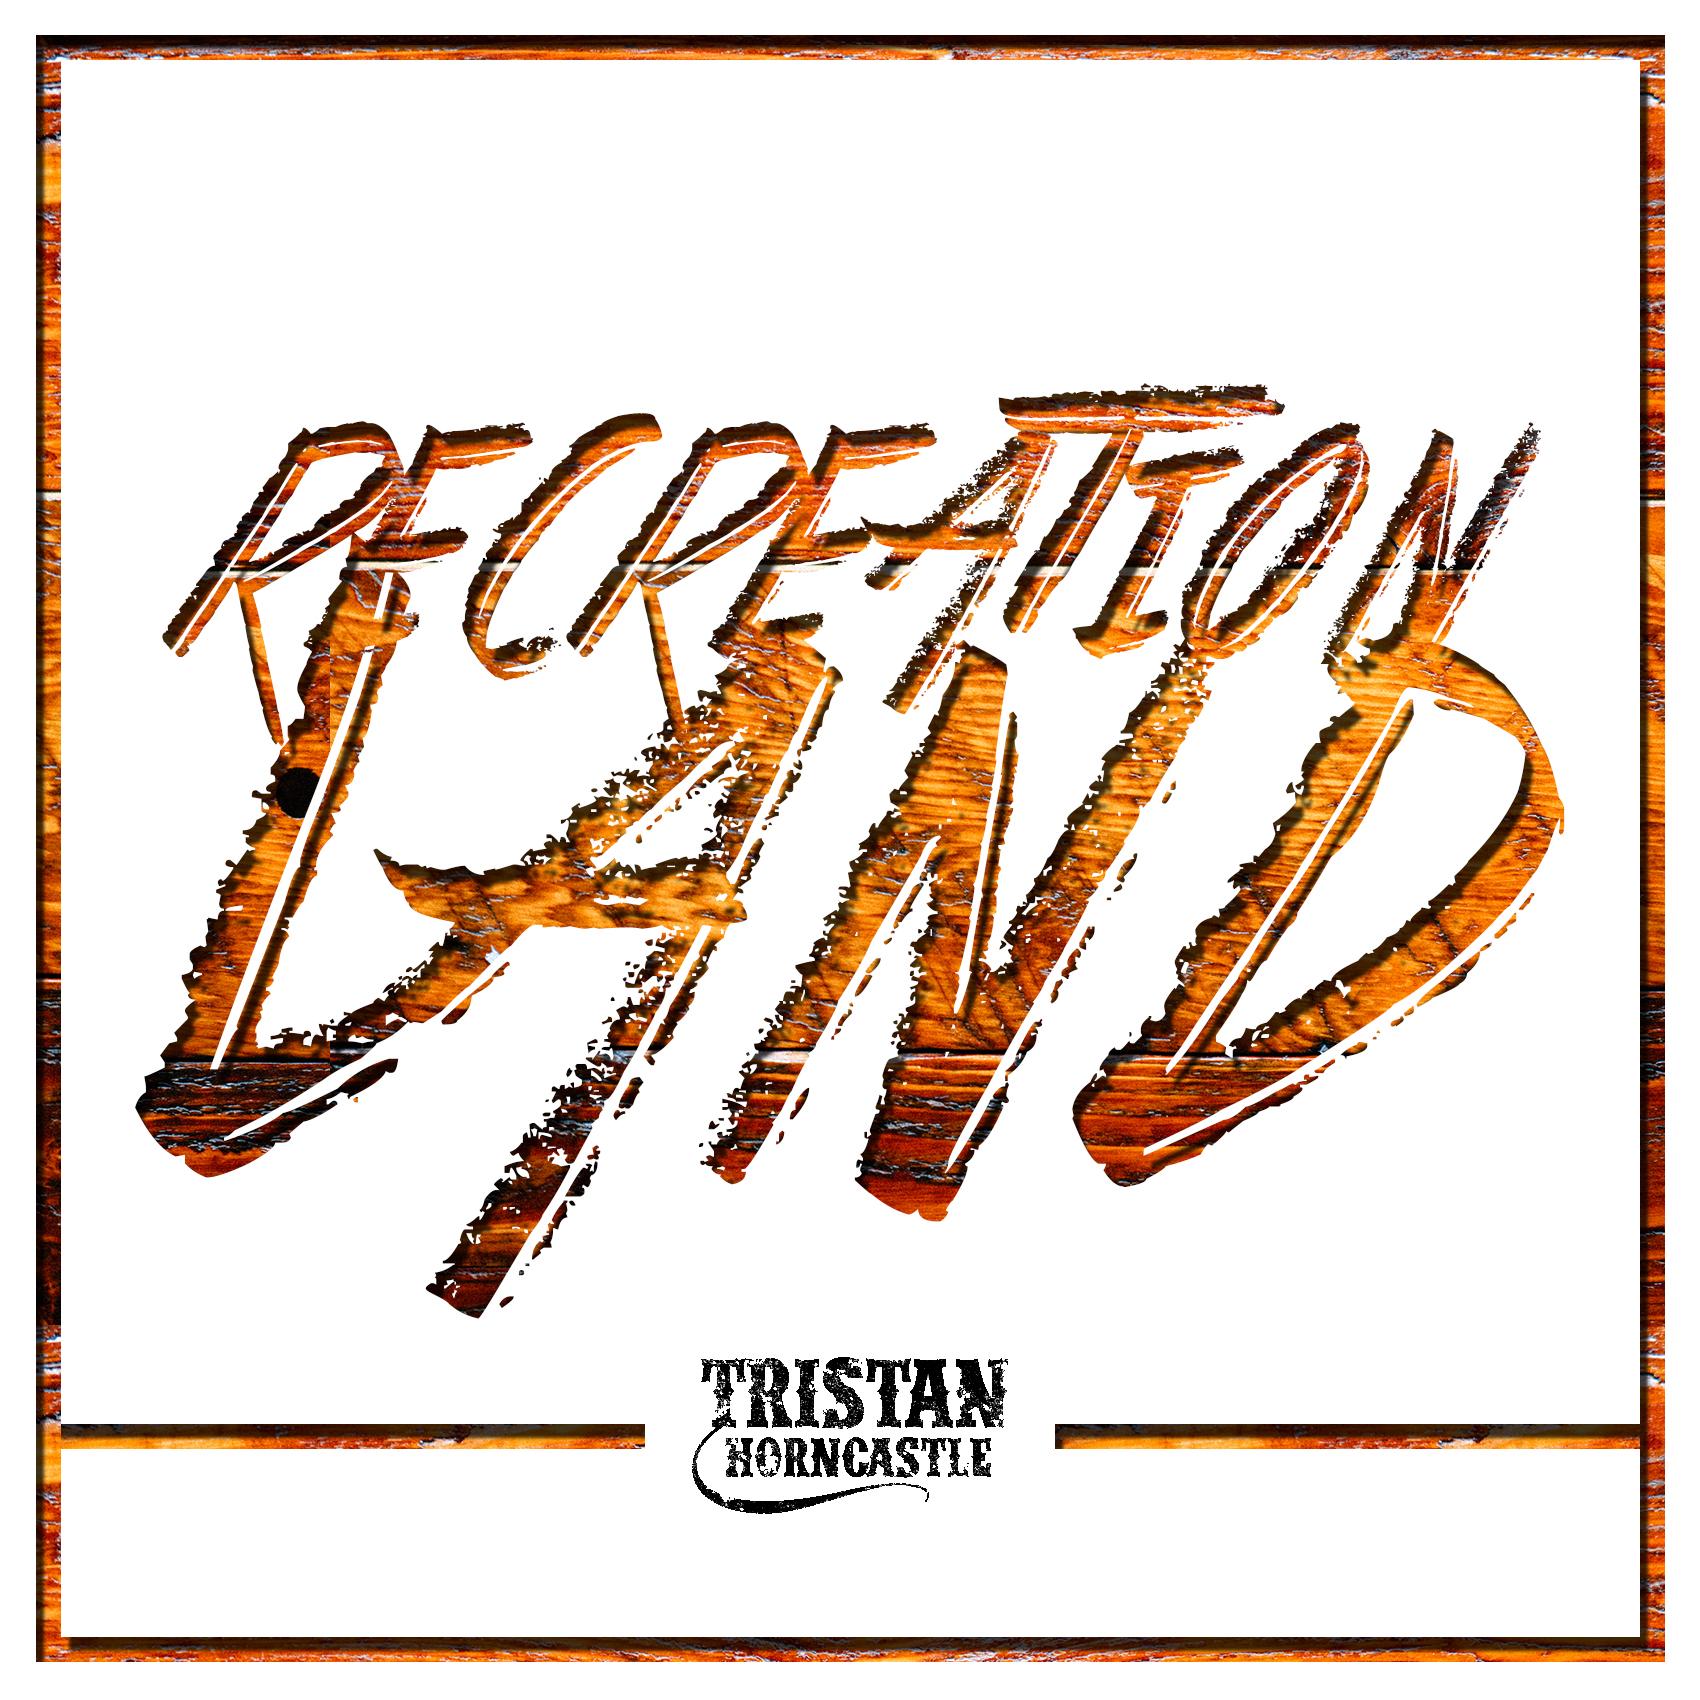 RecreationLand-CoverV1